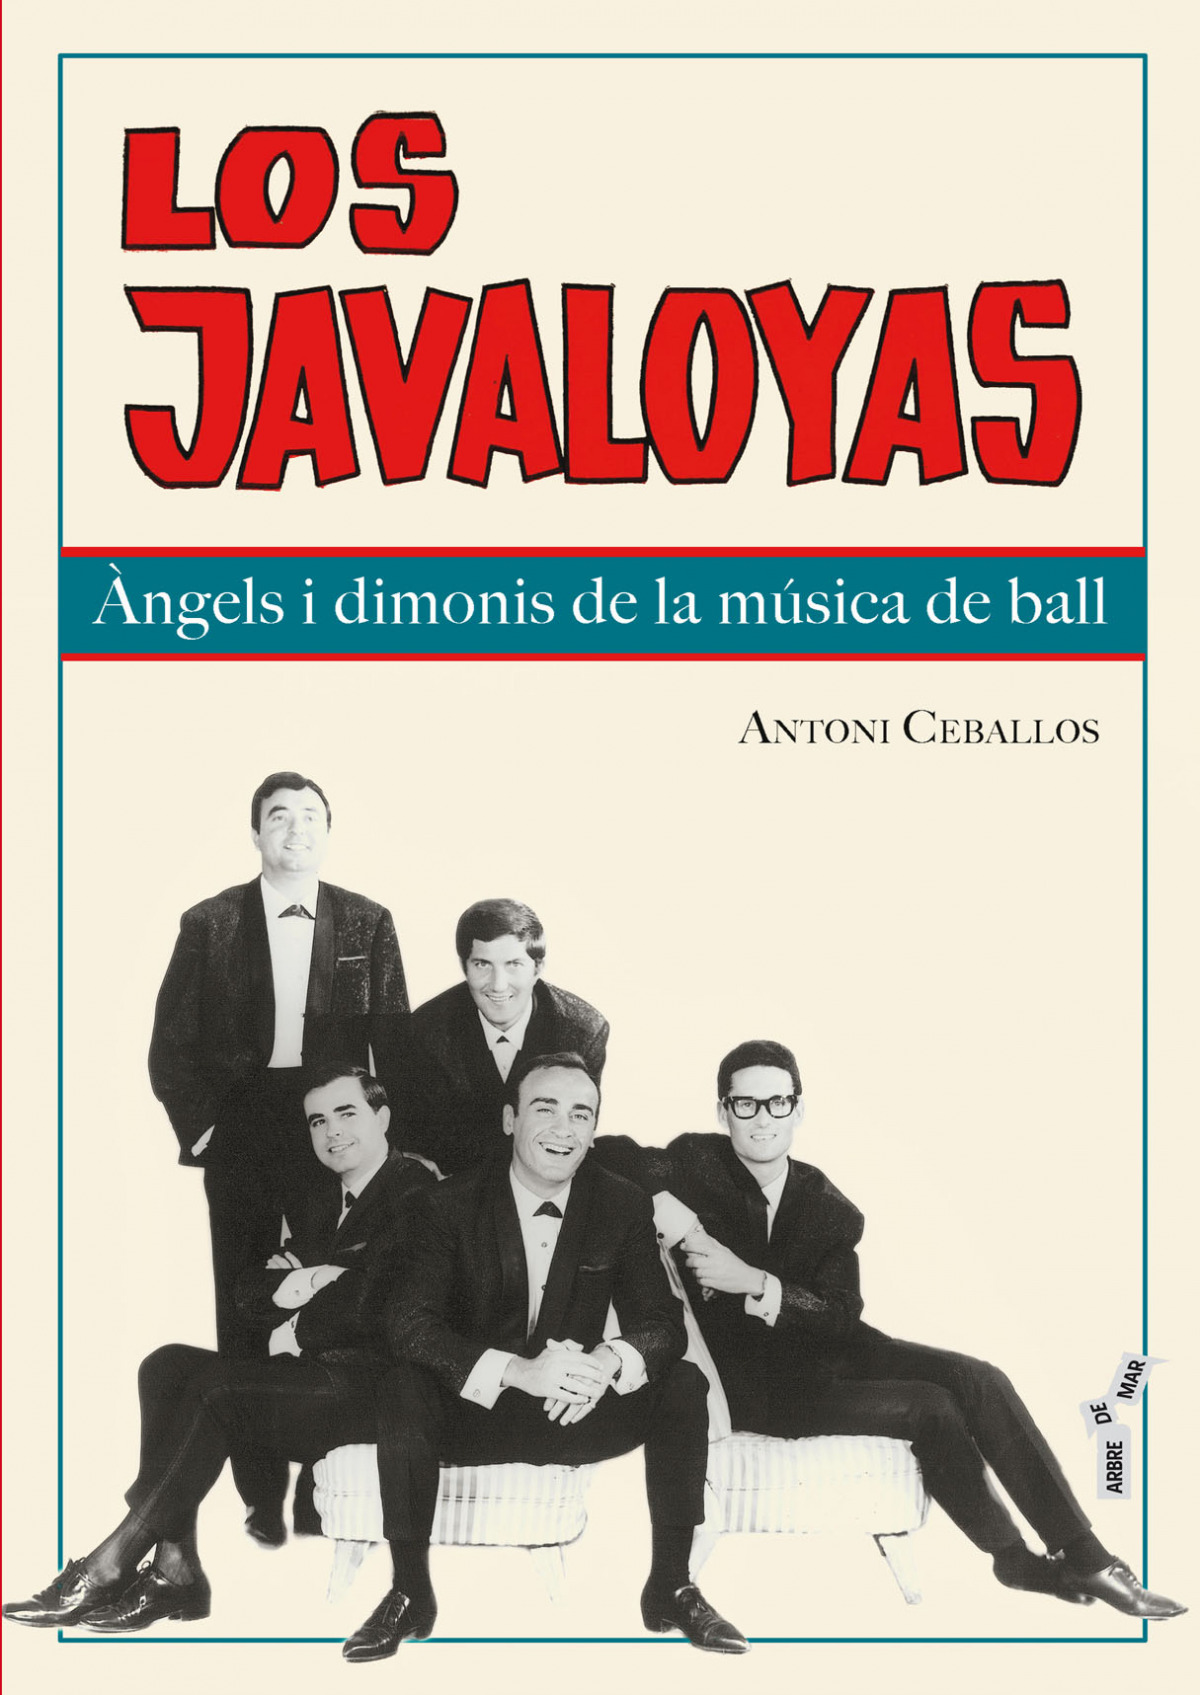 Los Javaloyas